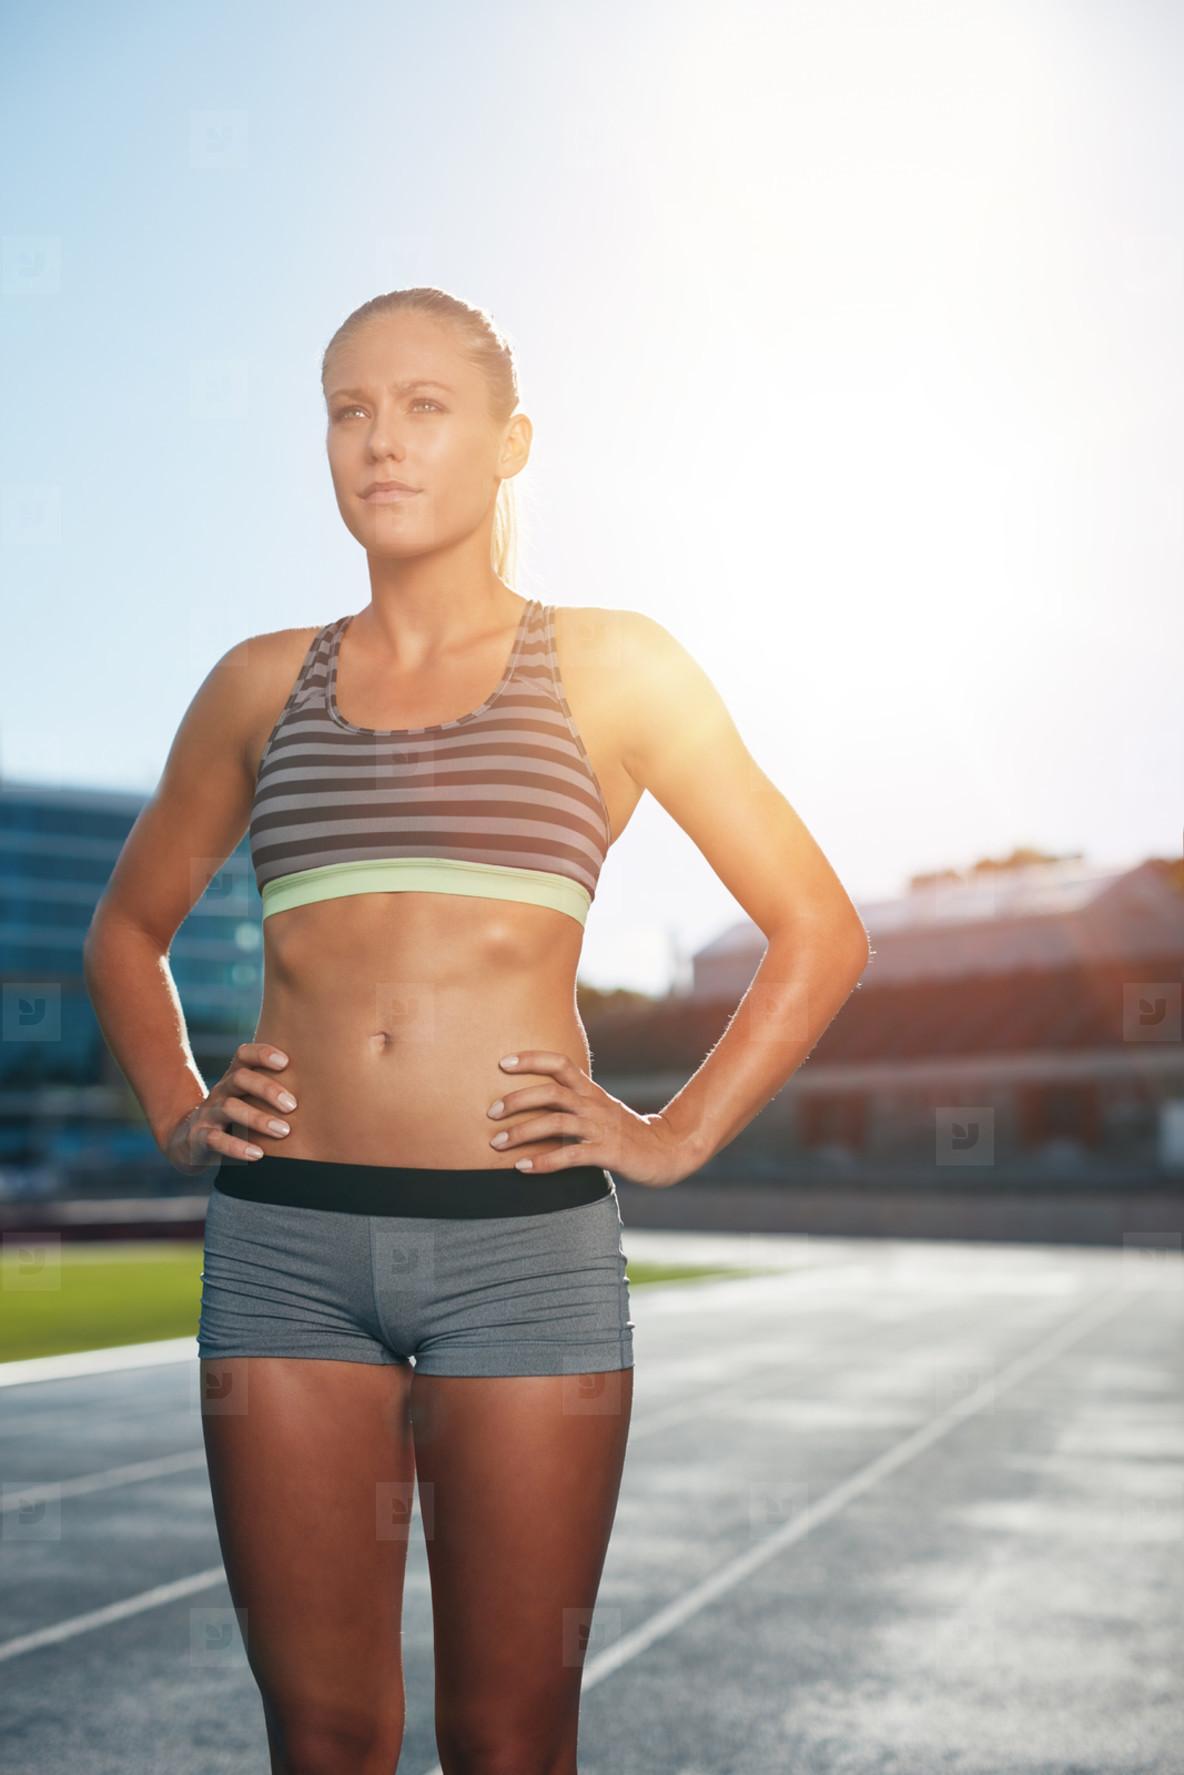 Confident athlete on athletics racetrack